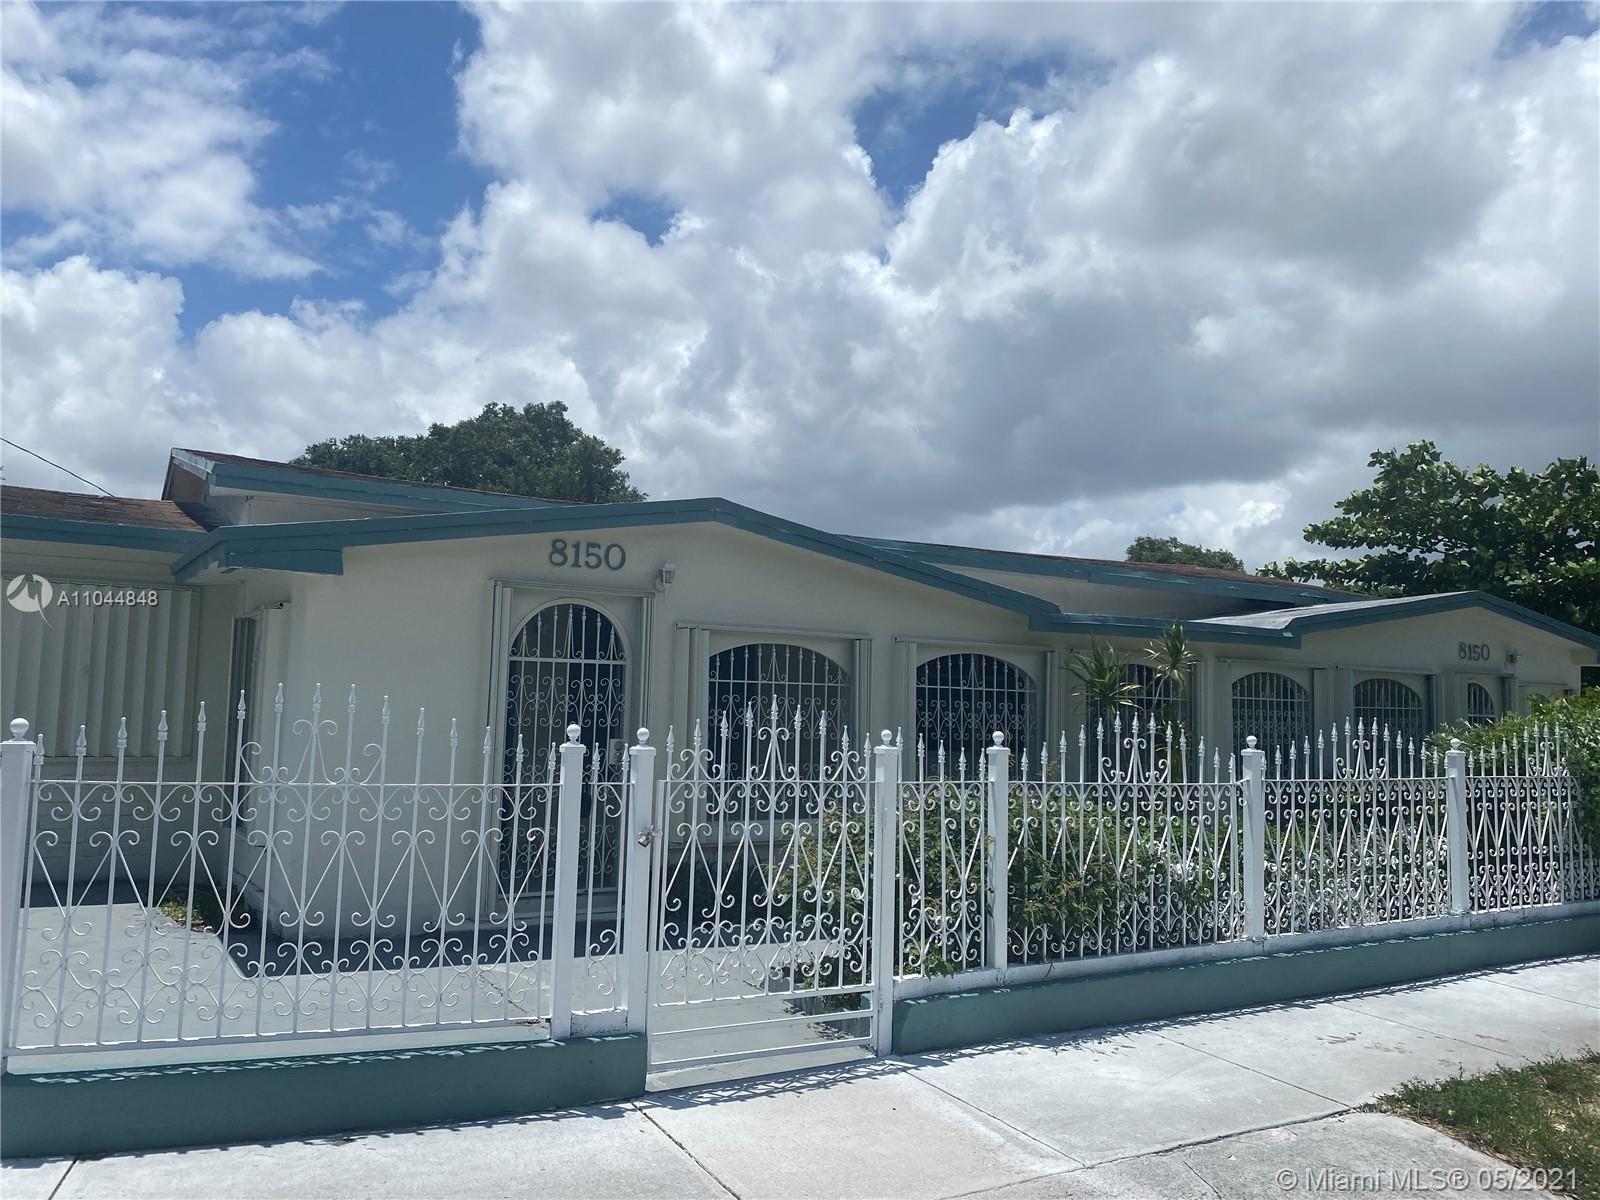 8150 NW 21st Ave, Miami, FL 33147 - #: A11044848